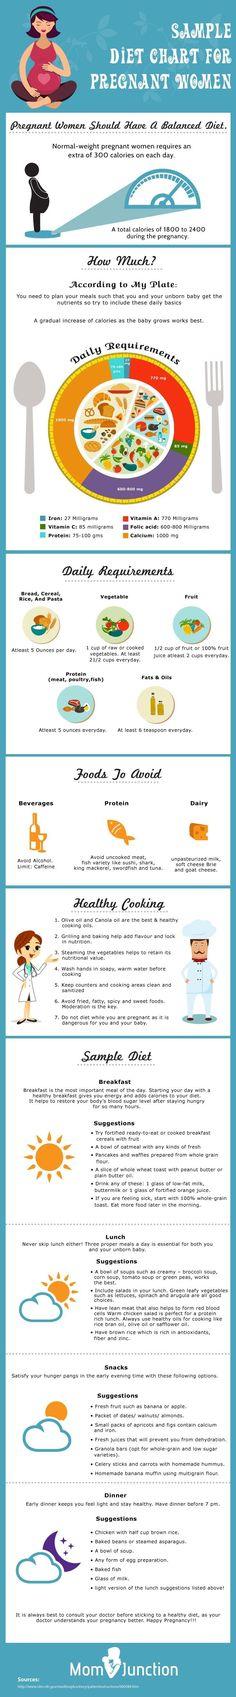 Diet plan reduce uric acid